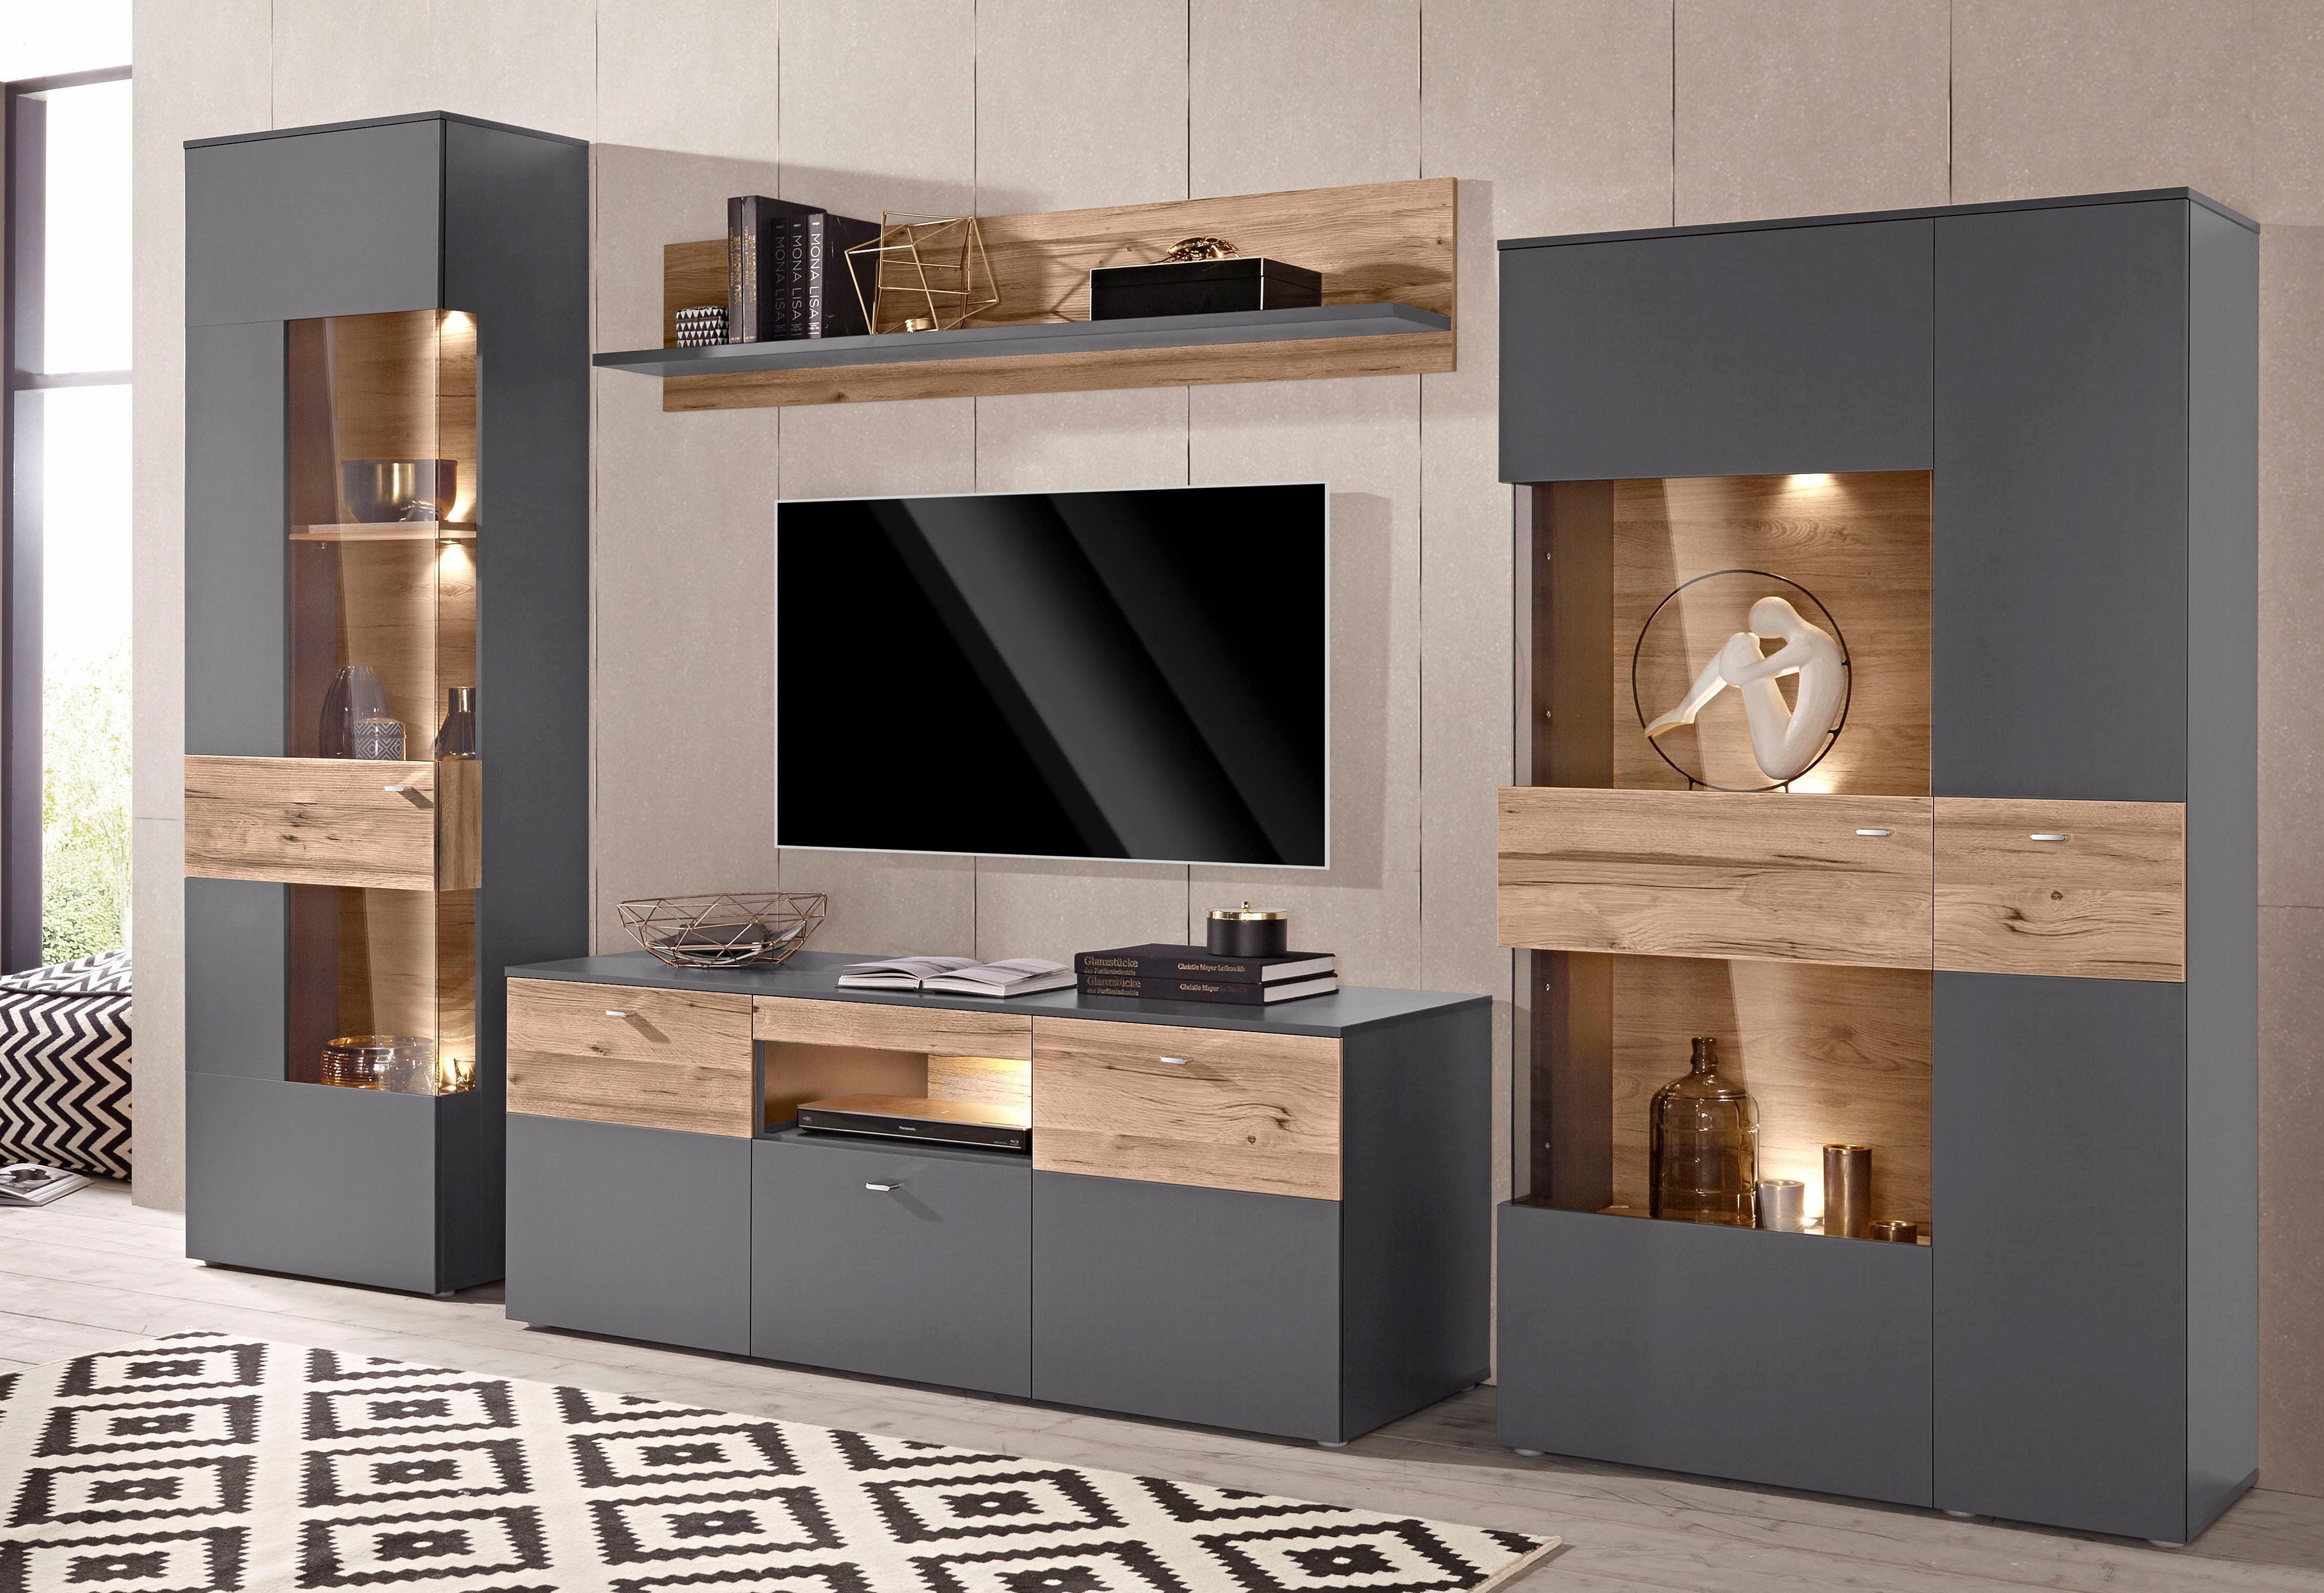 FORTE Wohnwand kaufen  BAUR  Tv room design, Living room design